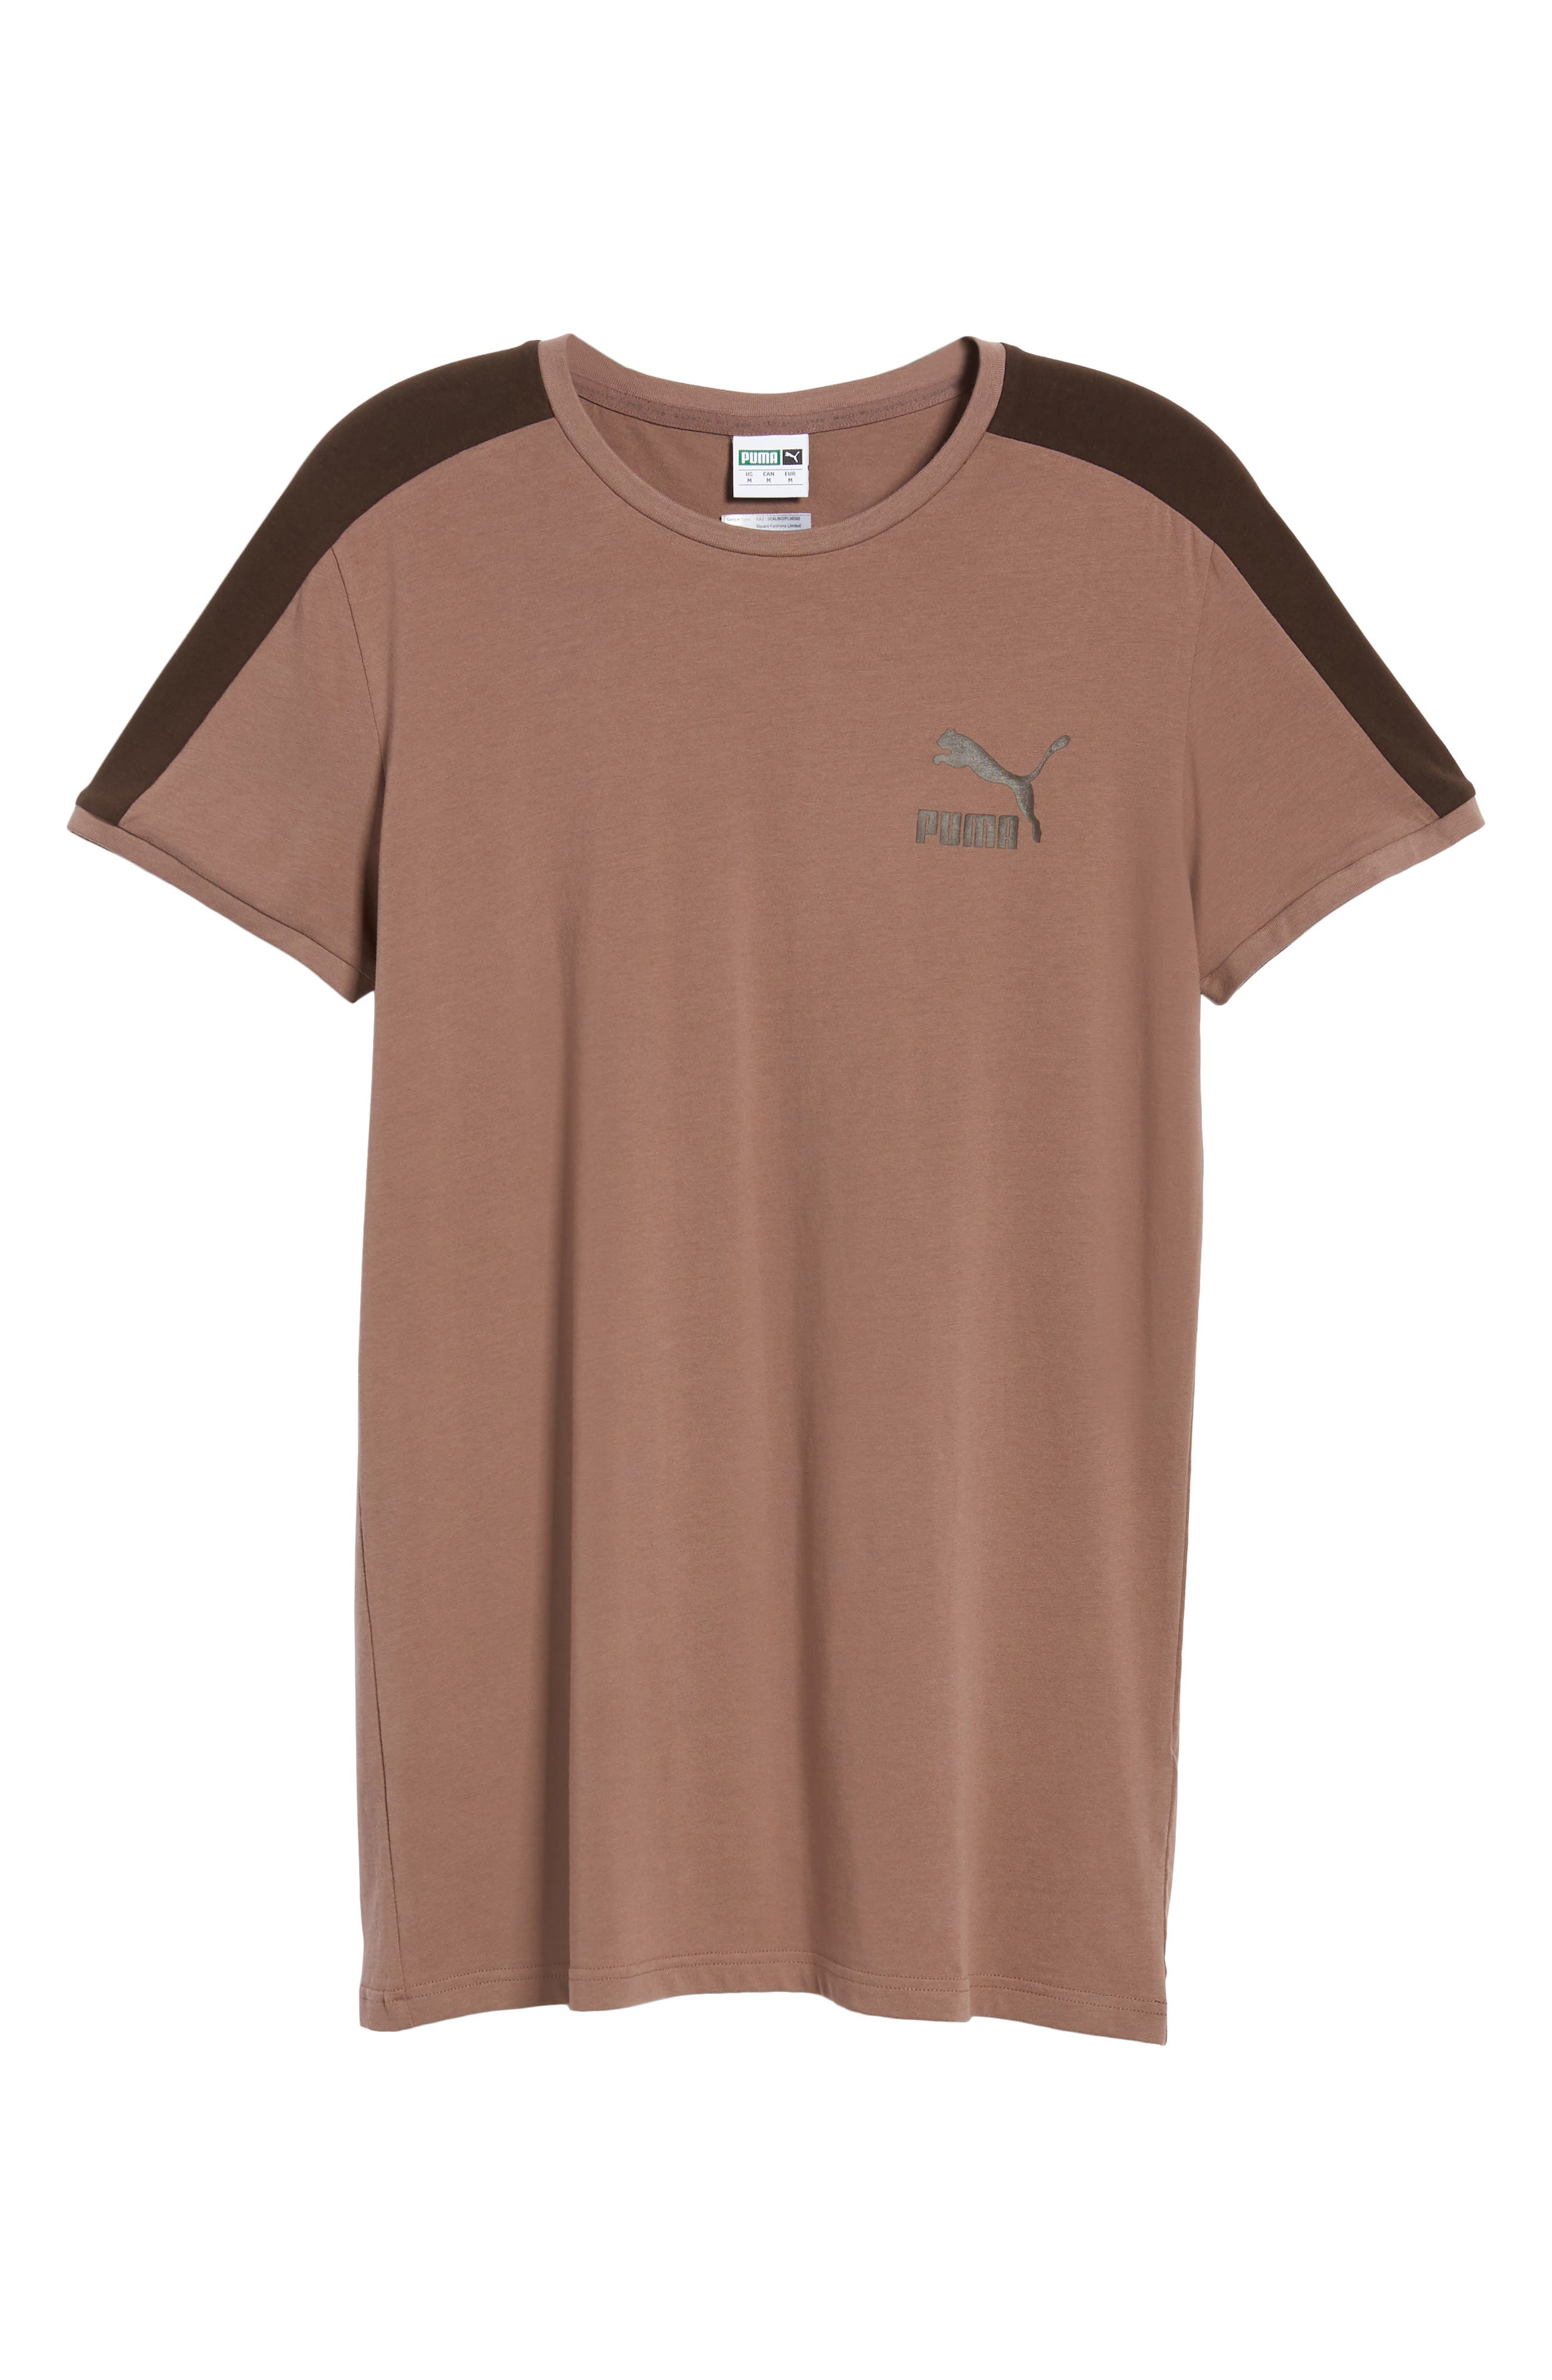 Classics Slim T7 T-Shirt,                             Alternate thumbnail 6, color,                             MEDIUM GRAY HEATHER